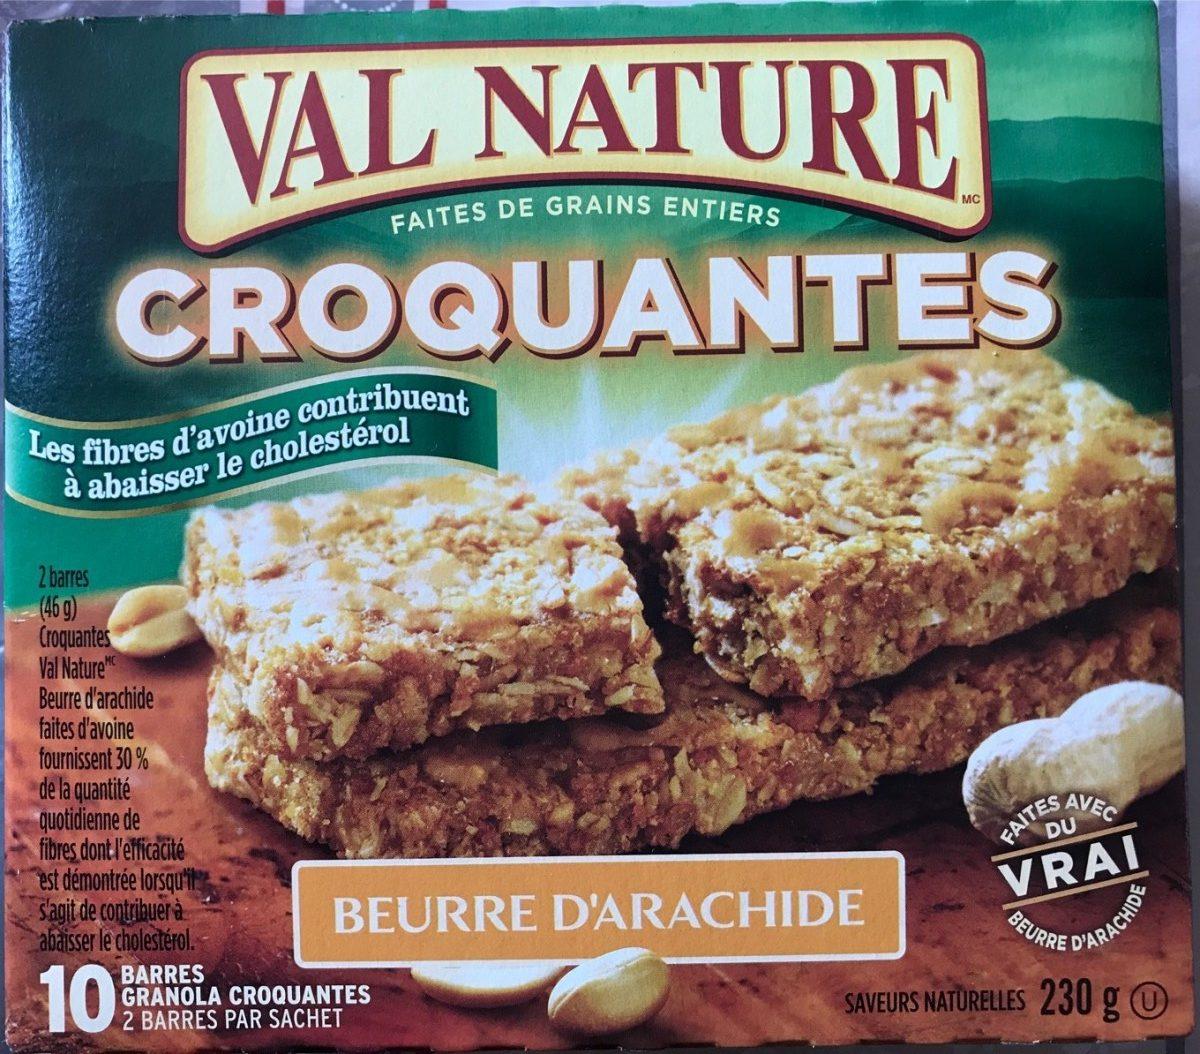 Barres Granola Croquantes Beurre d'Arachide - Product - fr